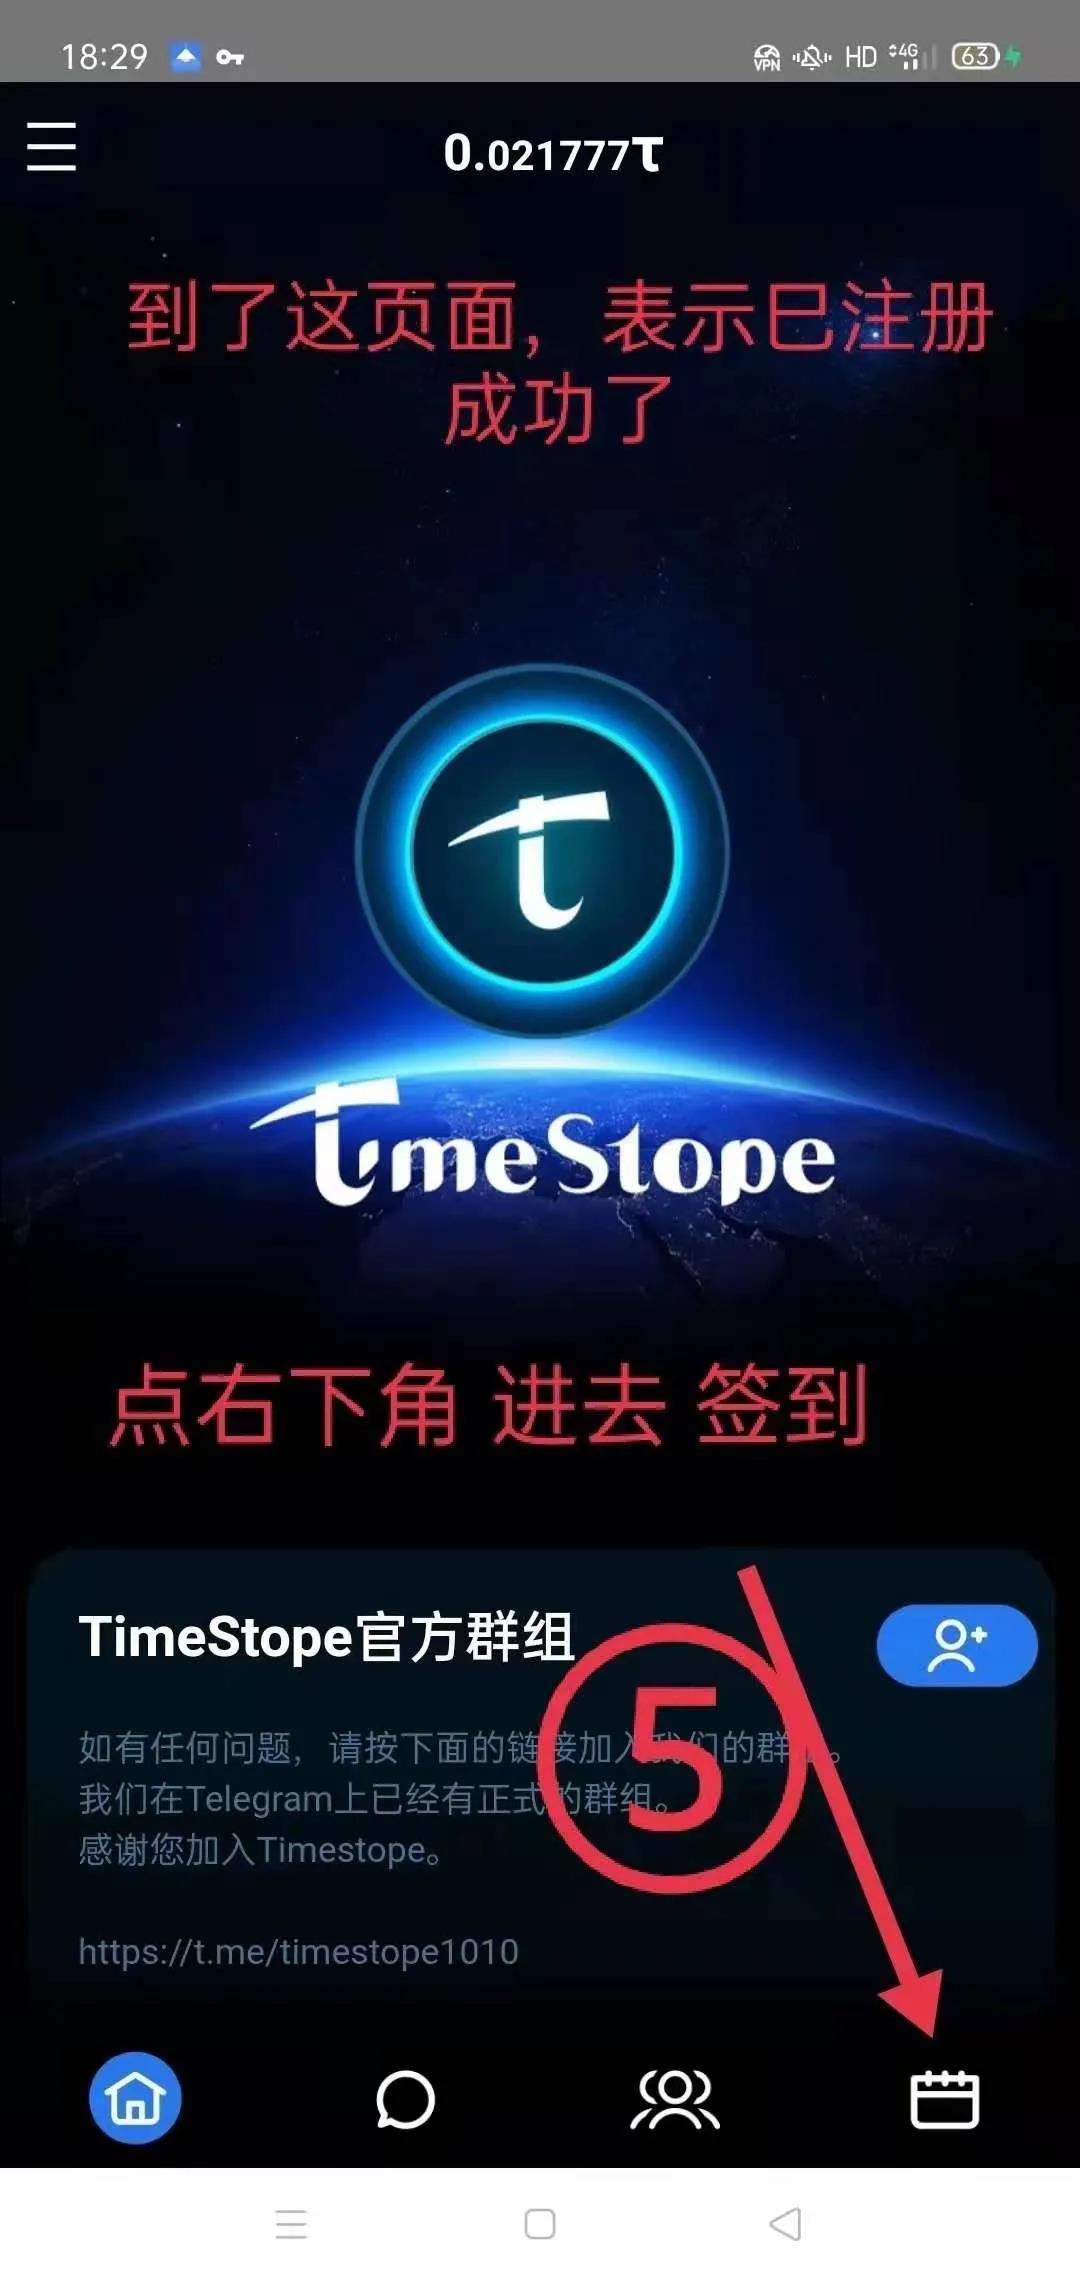 TimeStope挖矿下载-TimeStope最新版本下载